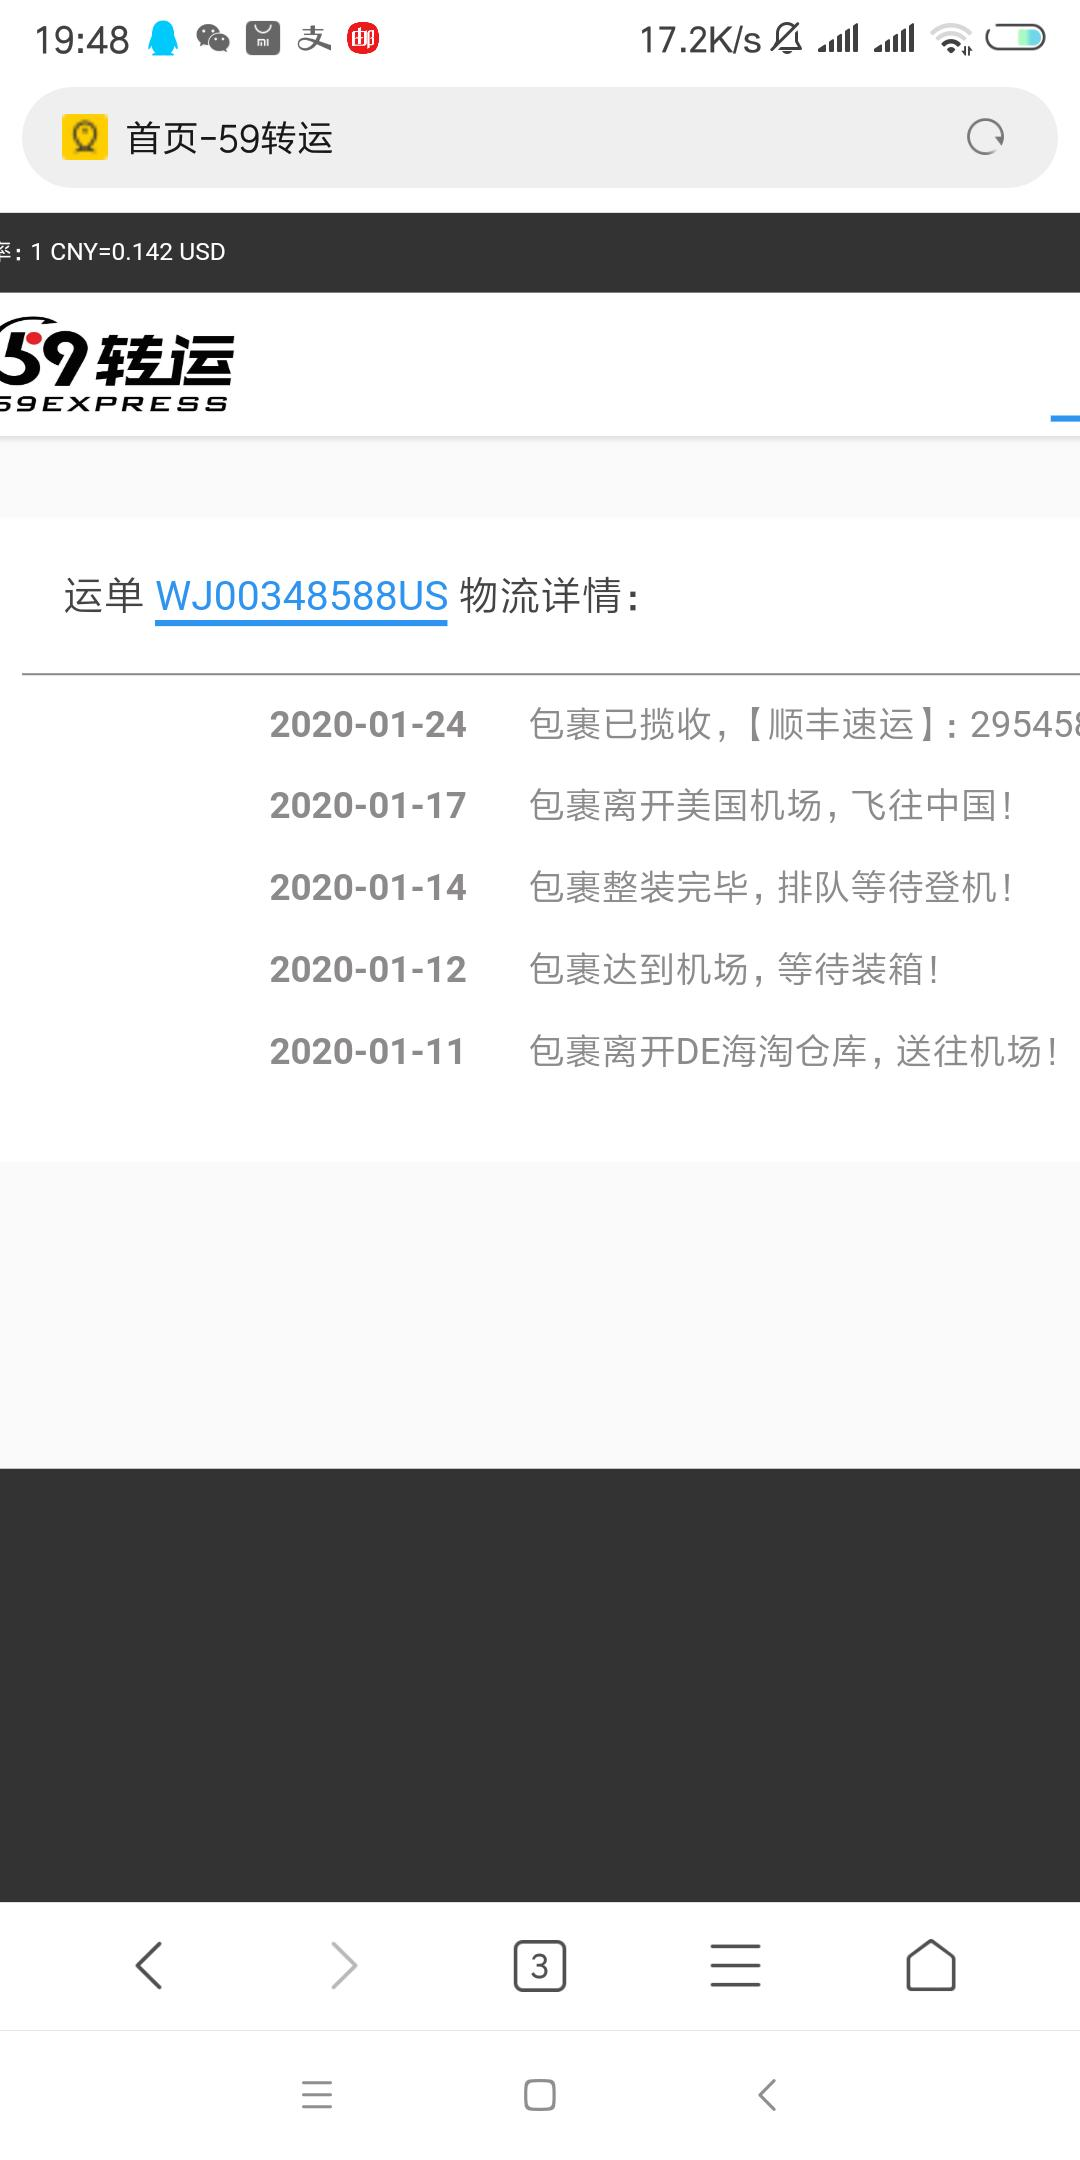 Screenshot_2020-01-28-19-48-12-352_com.android.browser.png